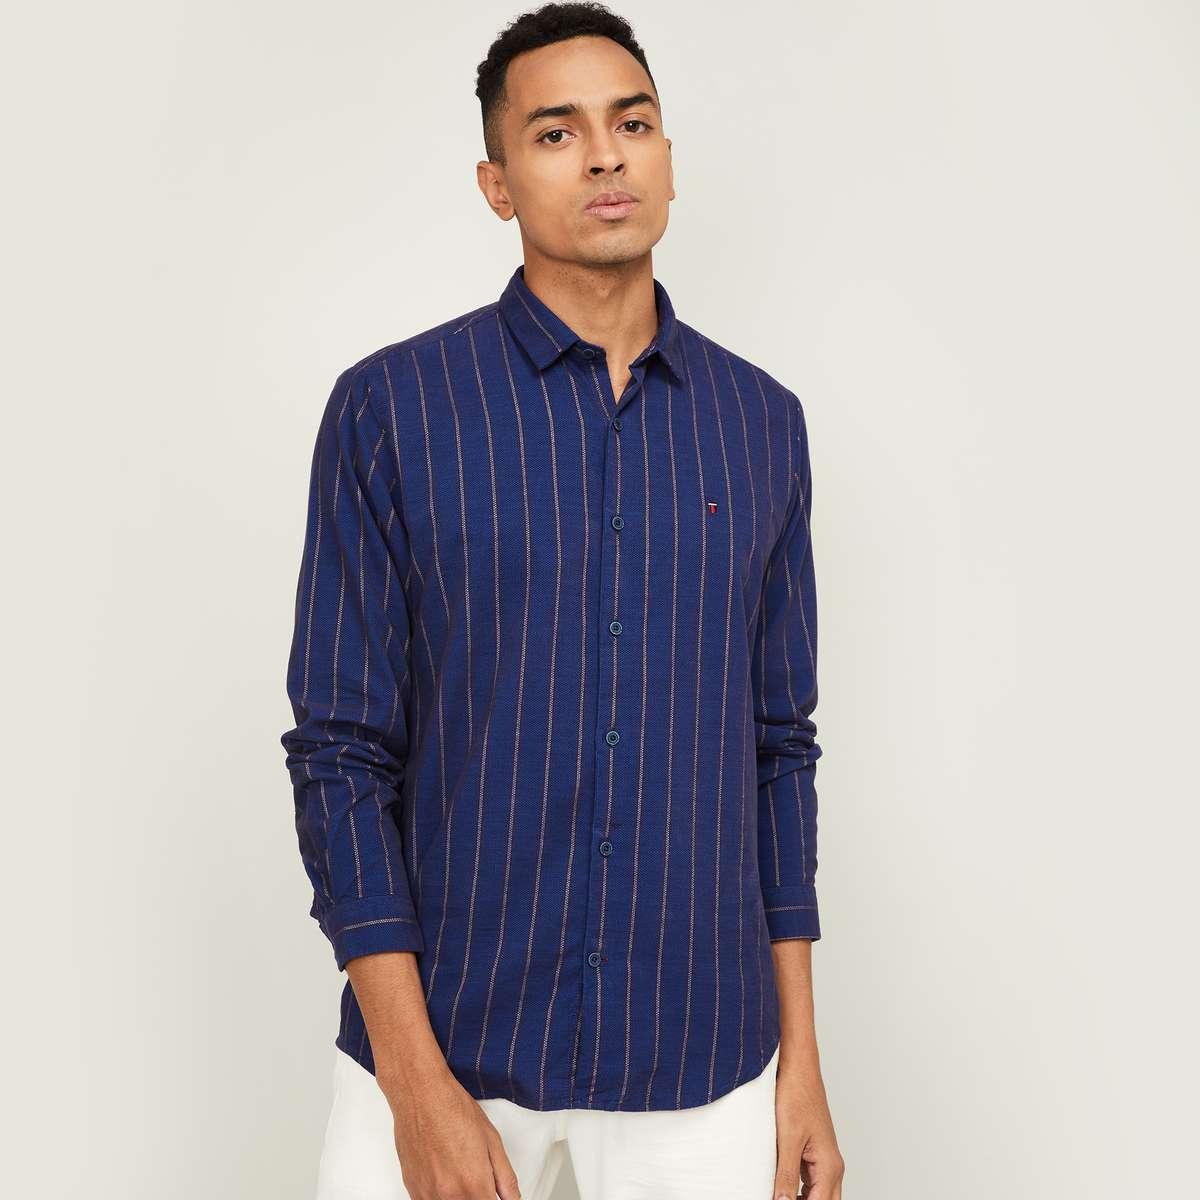 LP SPORT Men Striped Full Sleeves Super Slim Fit Casual Shirt